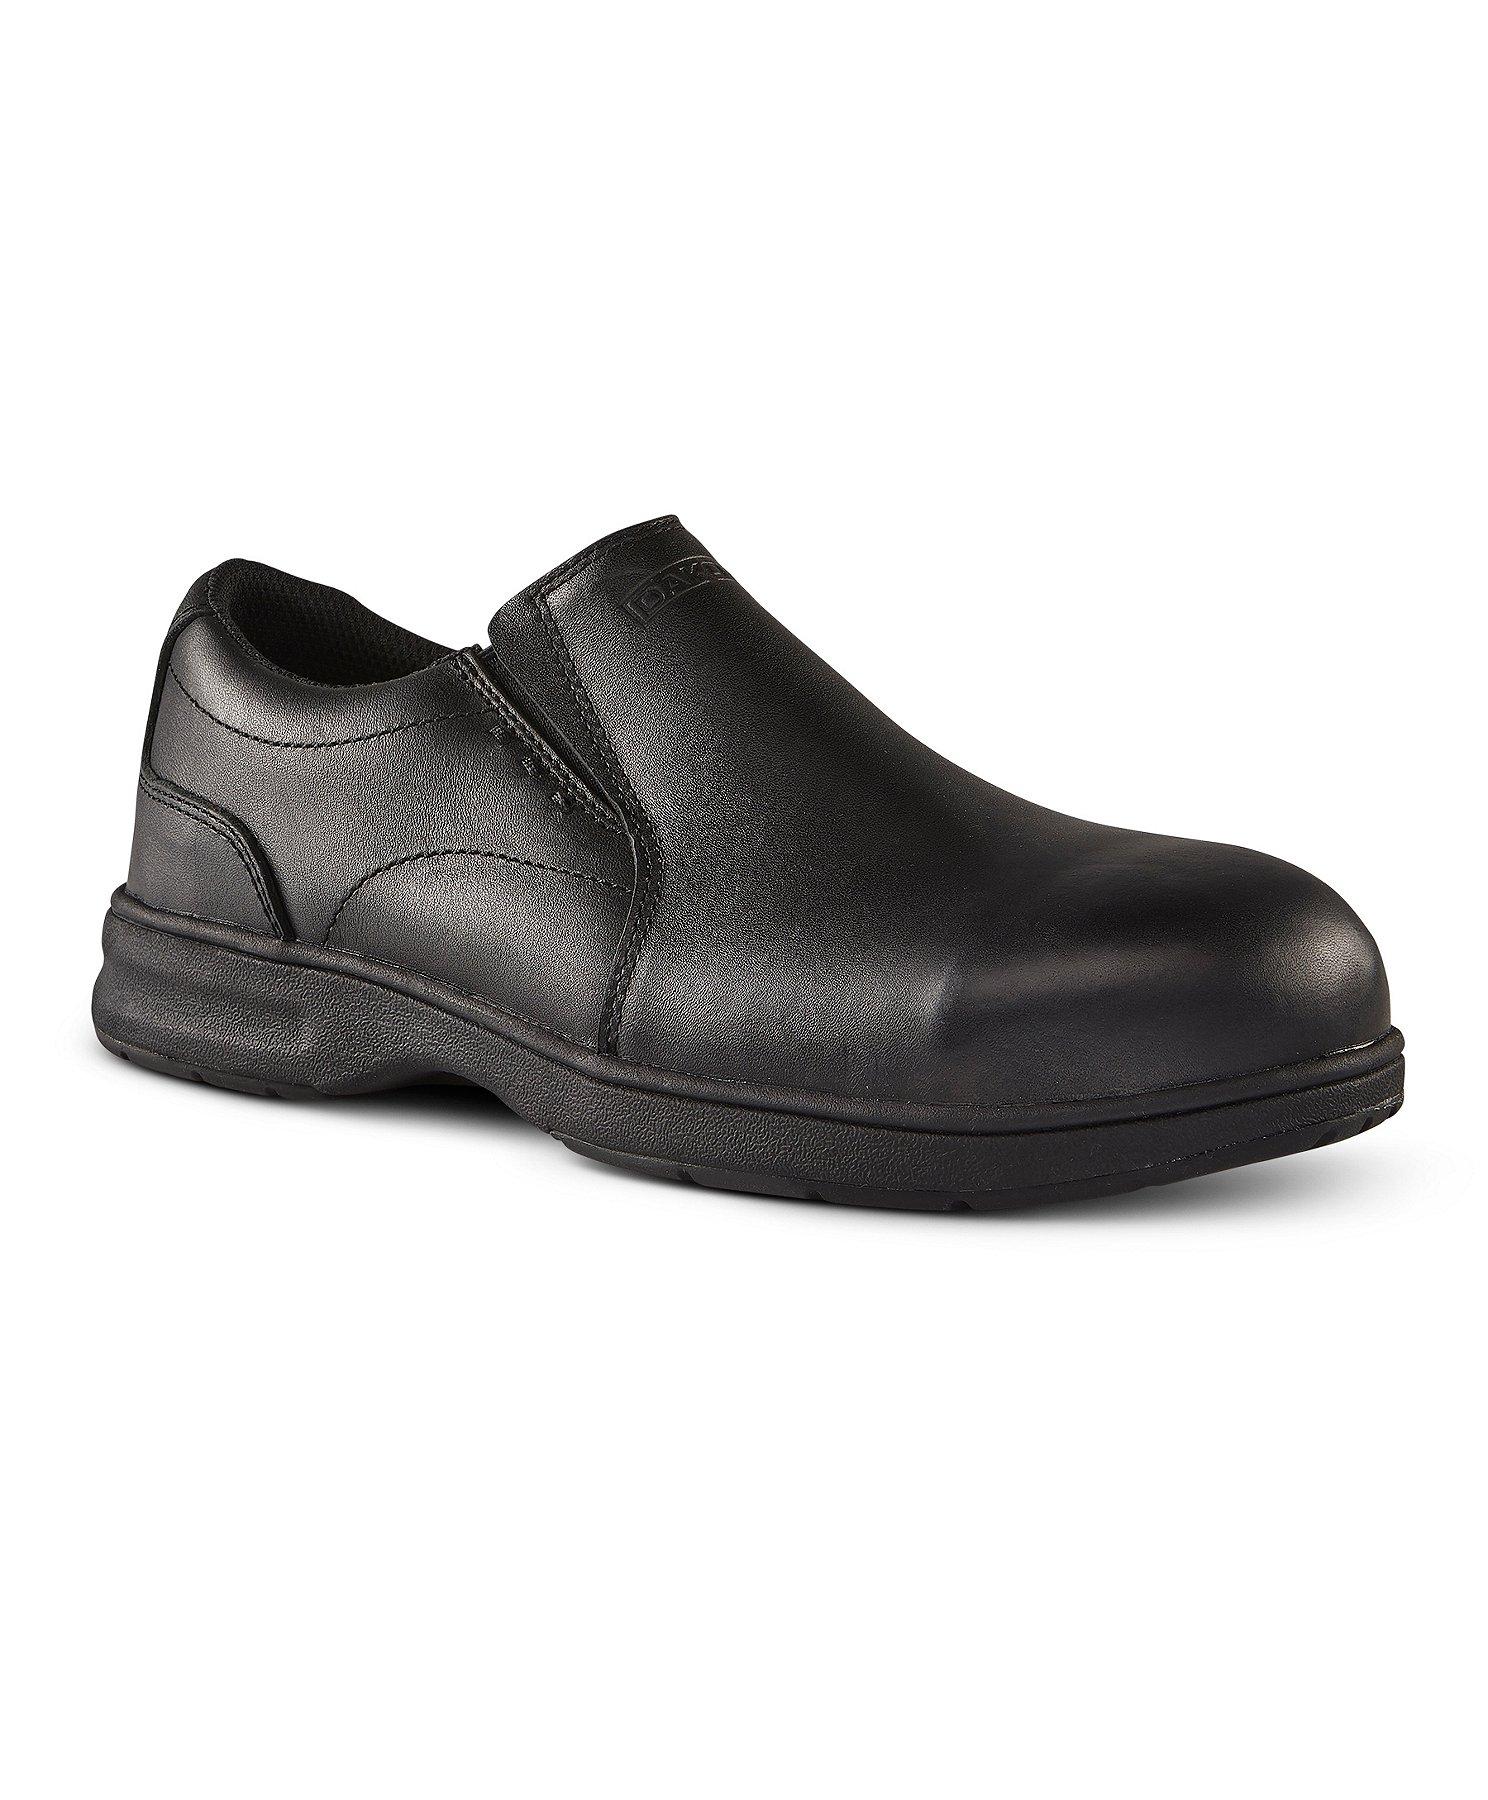 114e59abe1edd Men's Dakota ESD Aluminum Toe Slip On Leather Safety Shoe